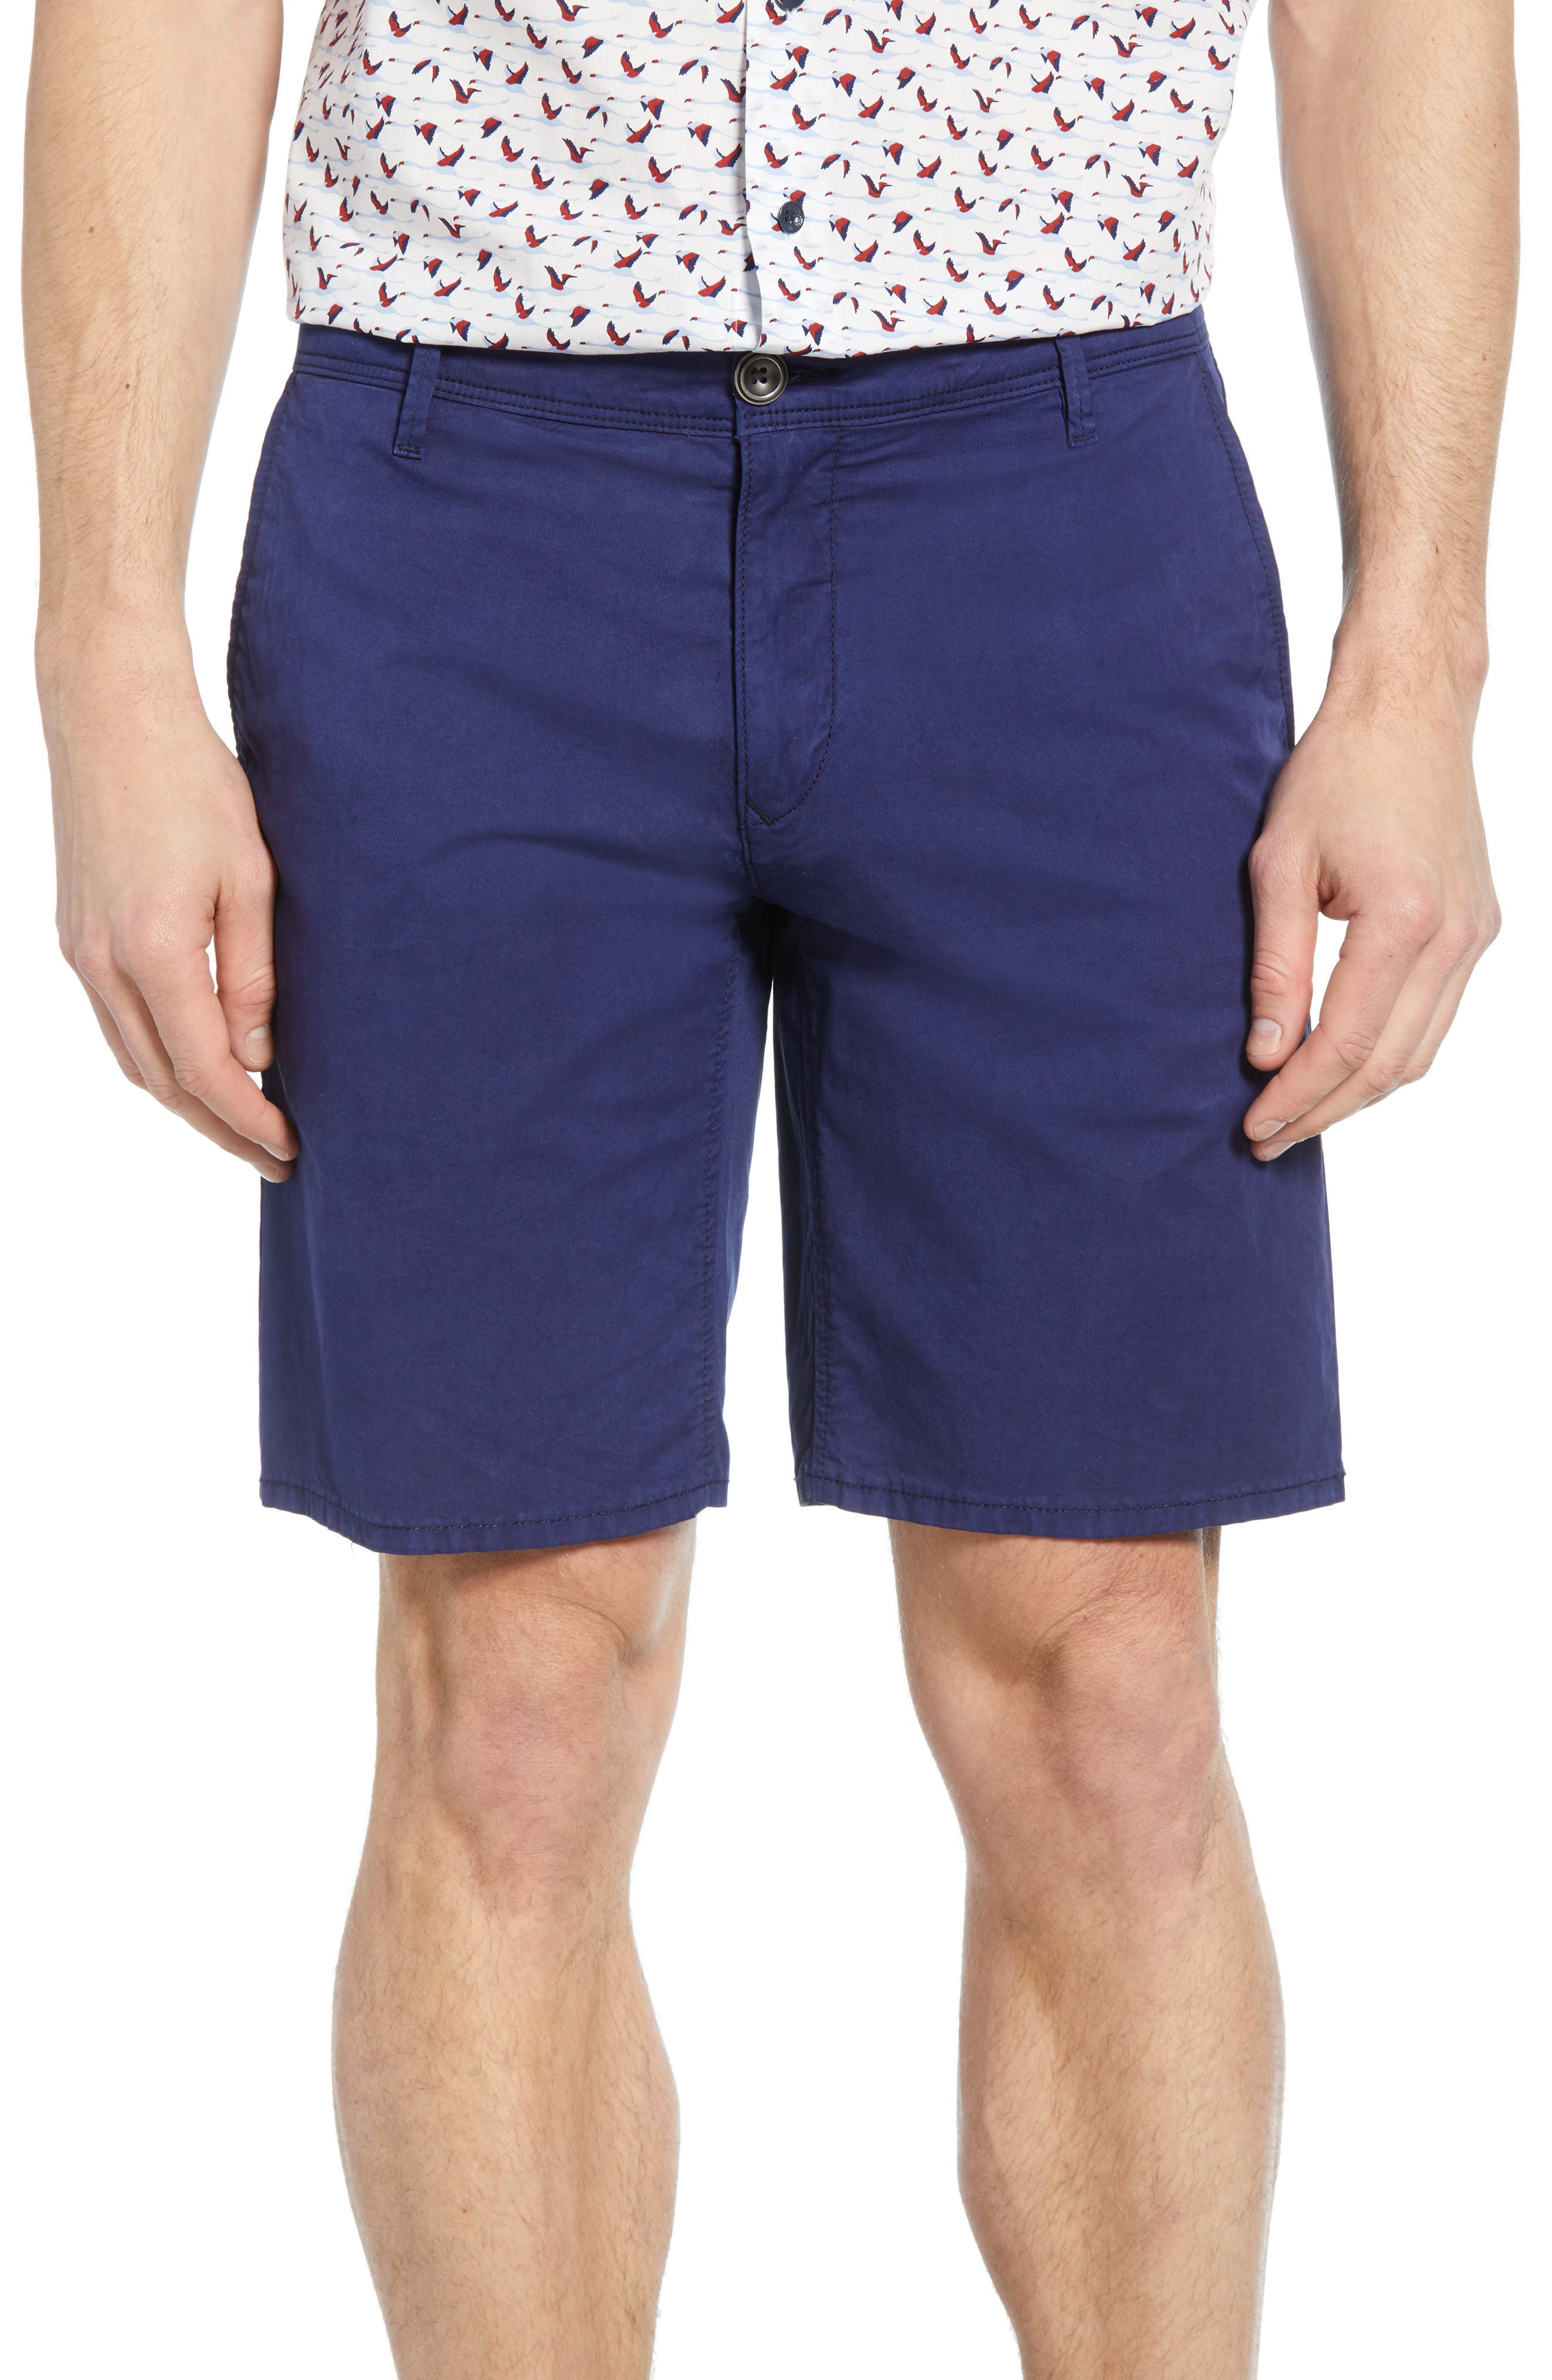 Image of RODD AND GUNN The Peaks Regular Fit Shorts